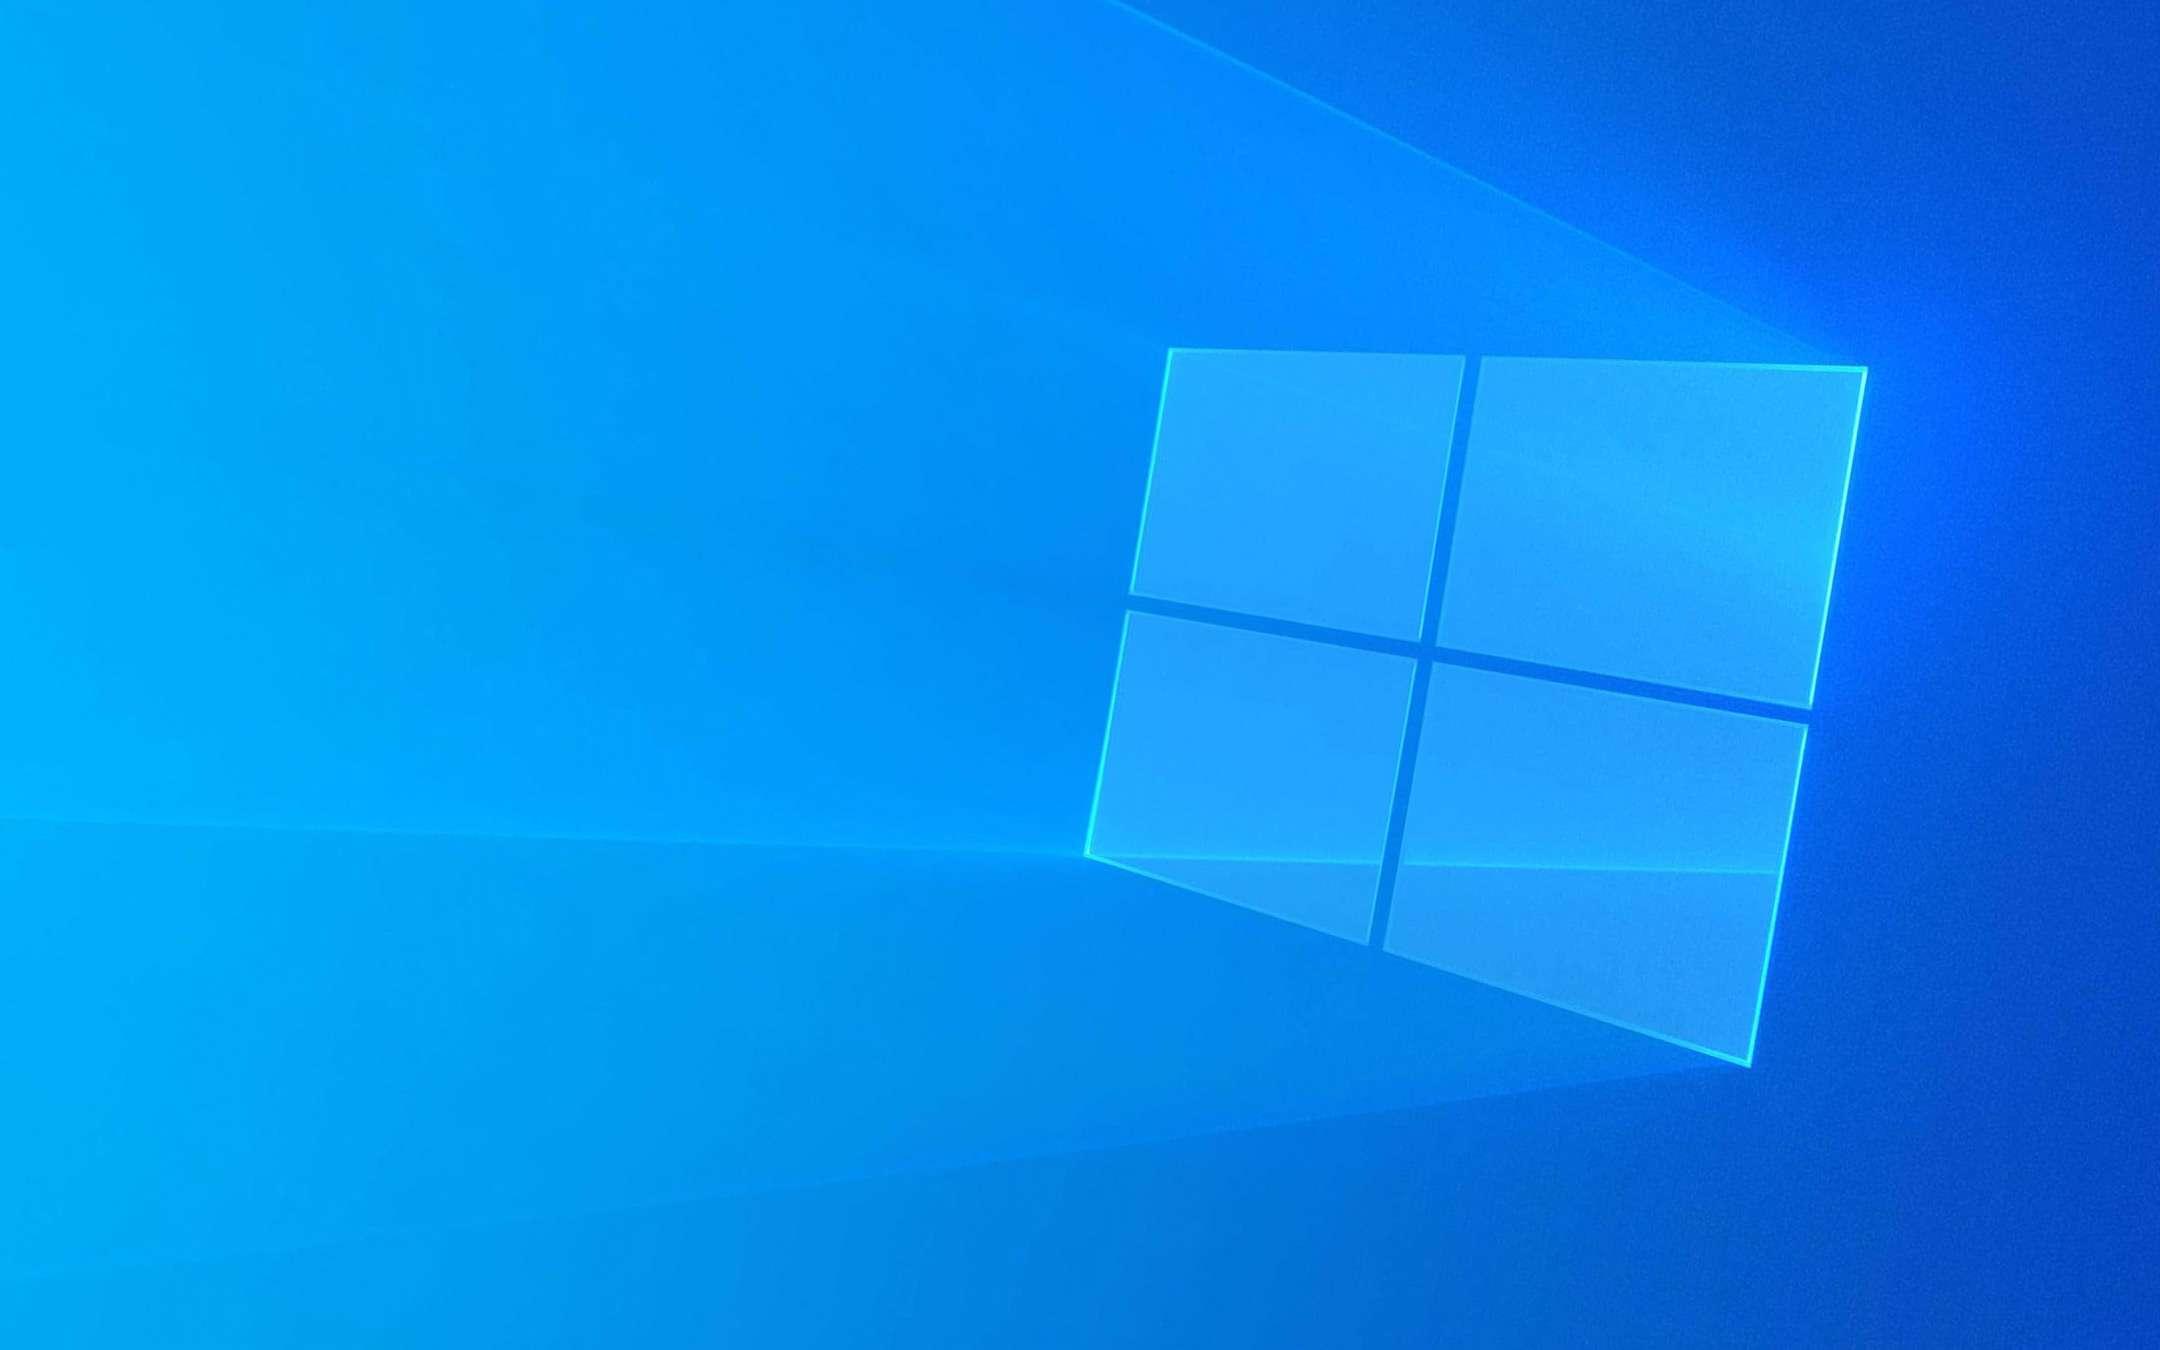 Windows 10 forces restart for Office Web Apps